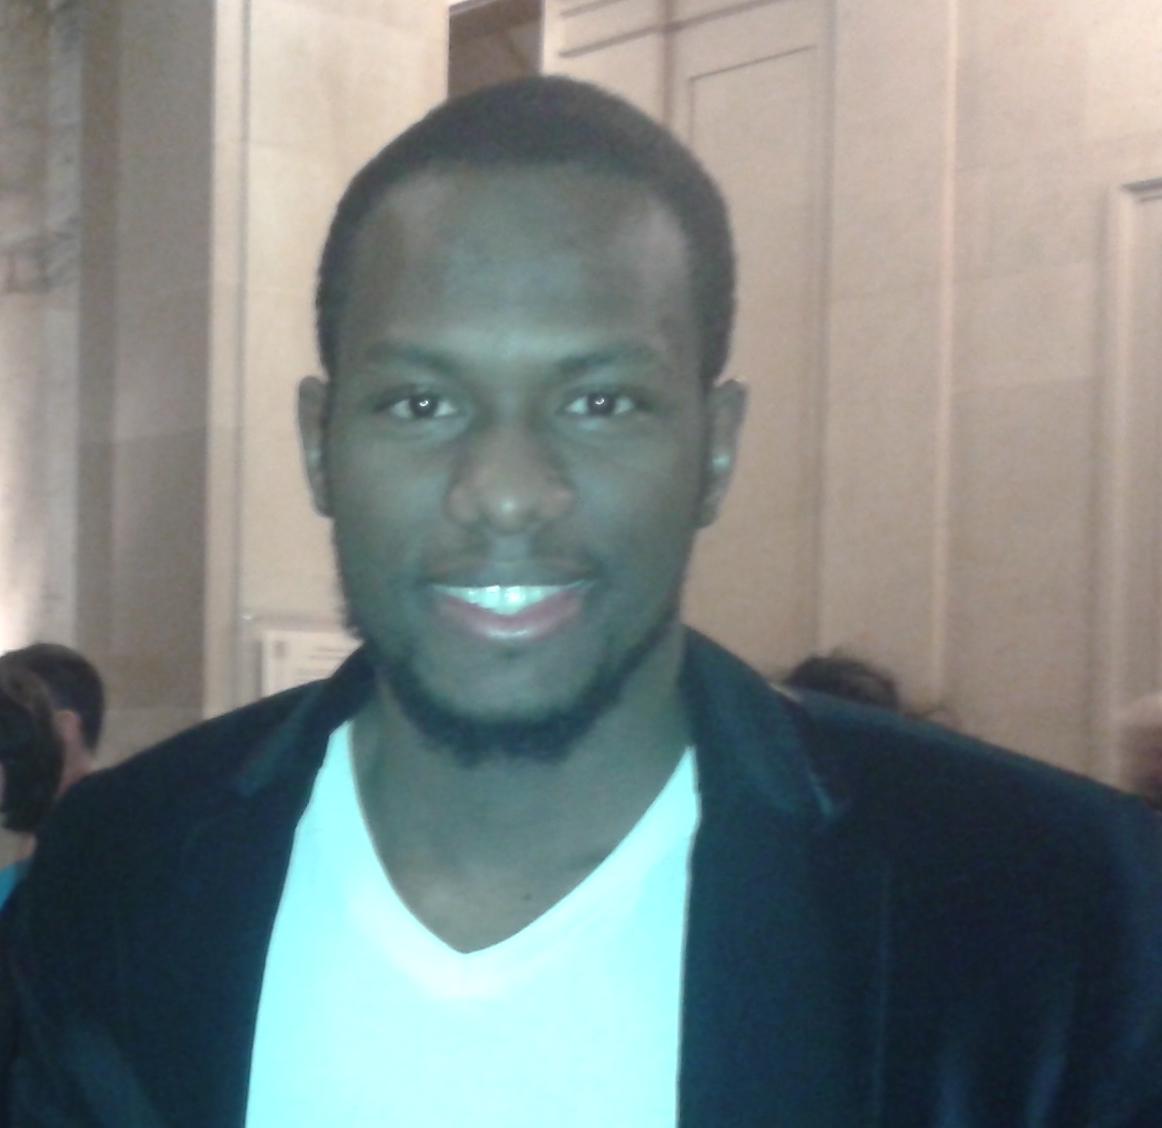 Chapeau bas! Honorable Thierno Bocoum!